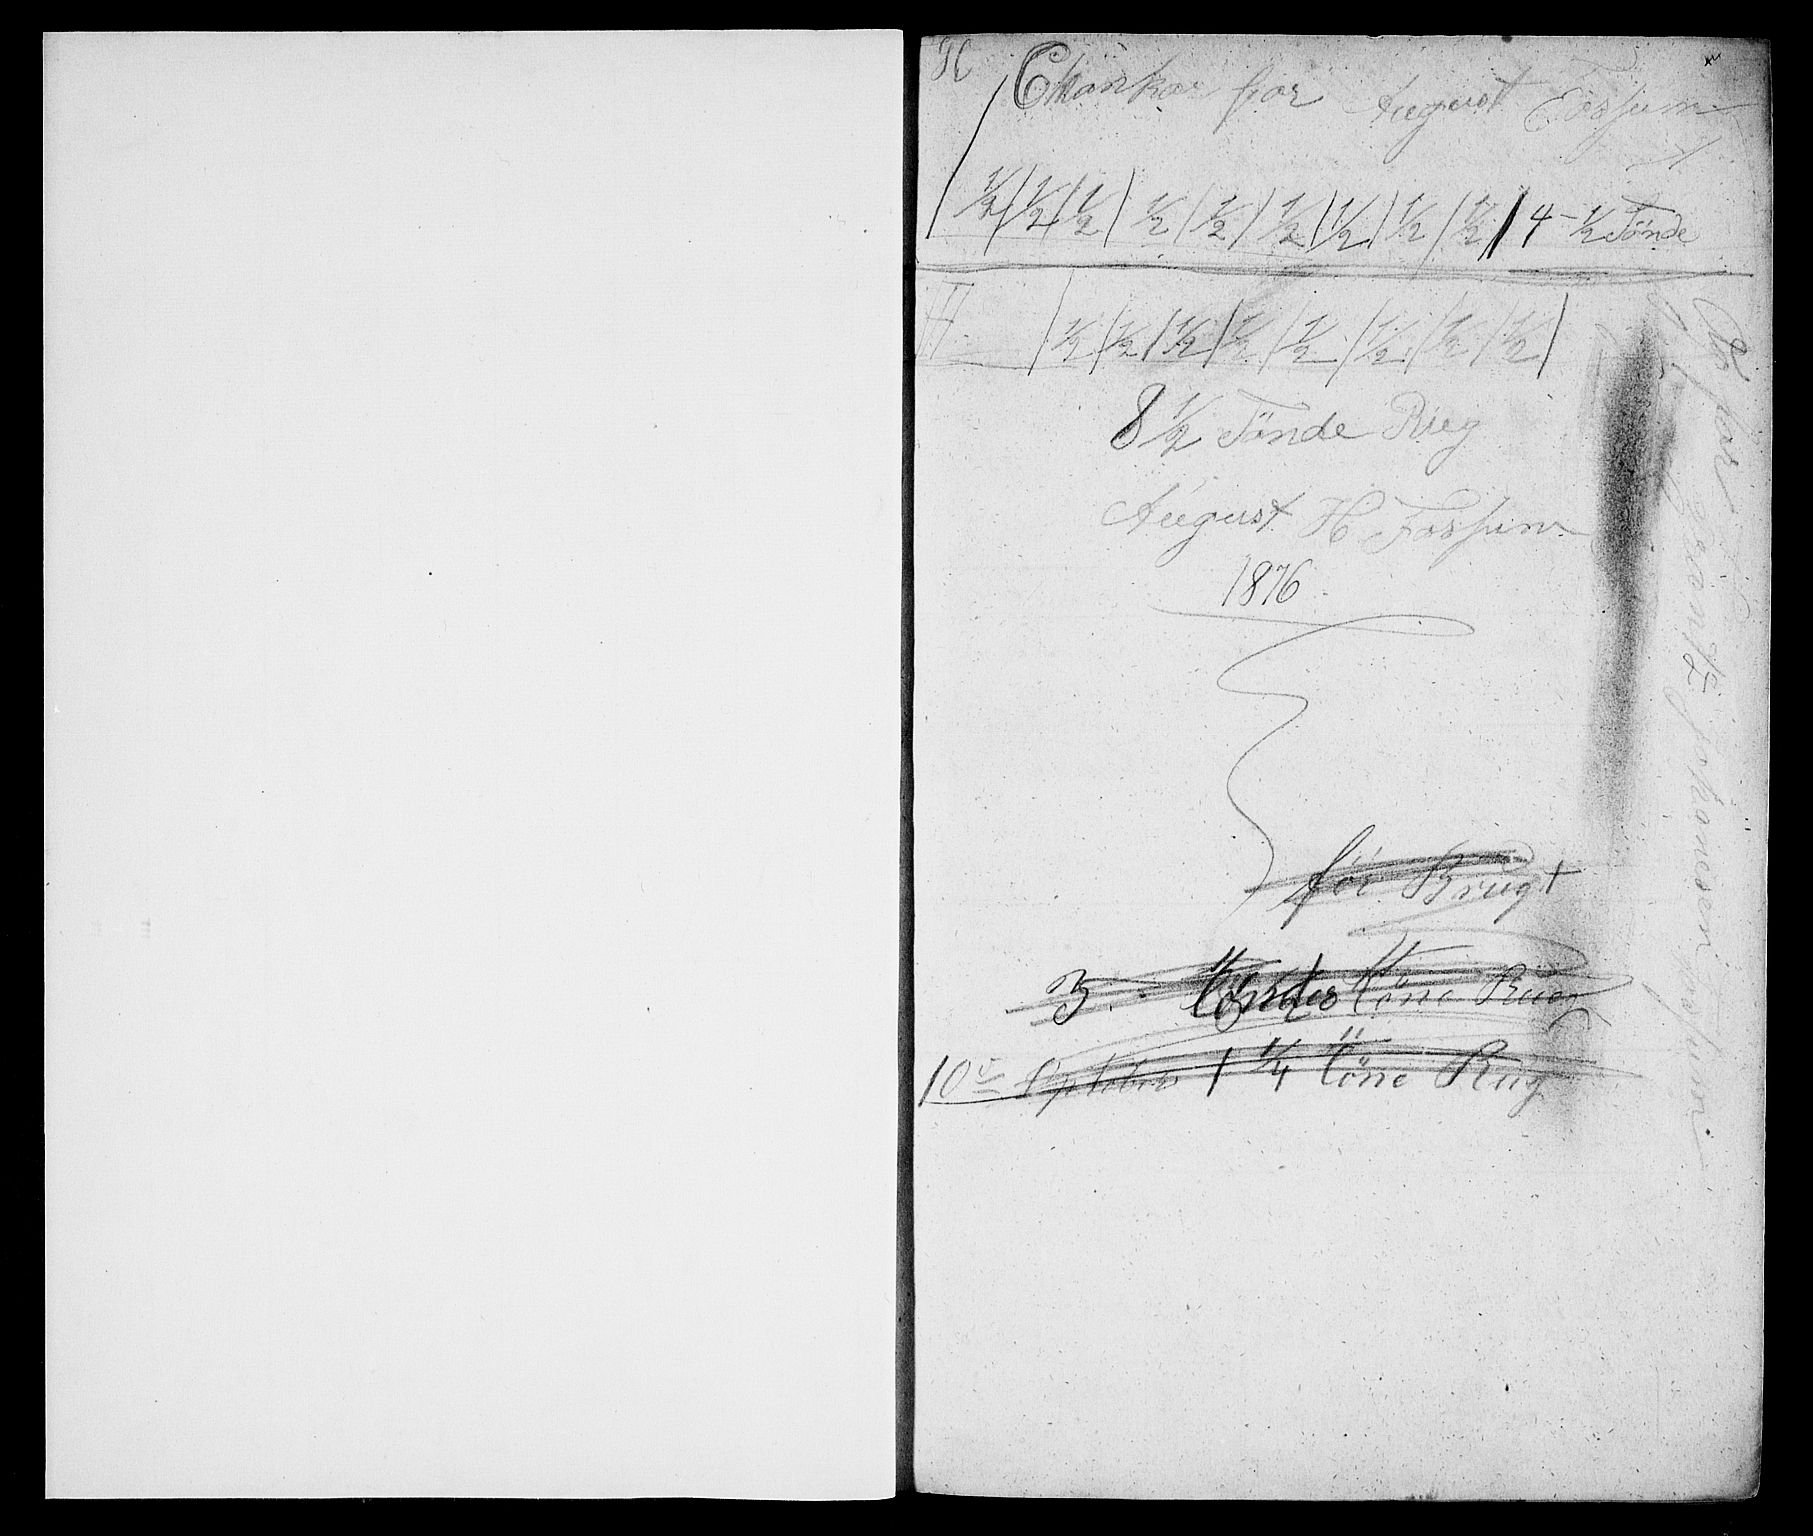 RA, Modums Blaafarveværk, G/Gd/Gda/L0172, 1841-1847, s. 2